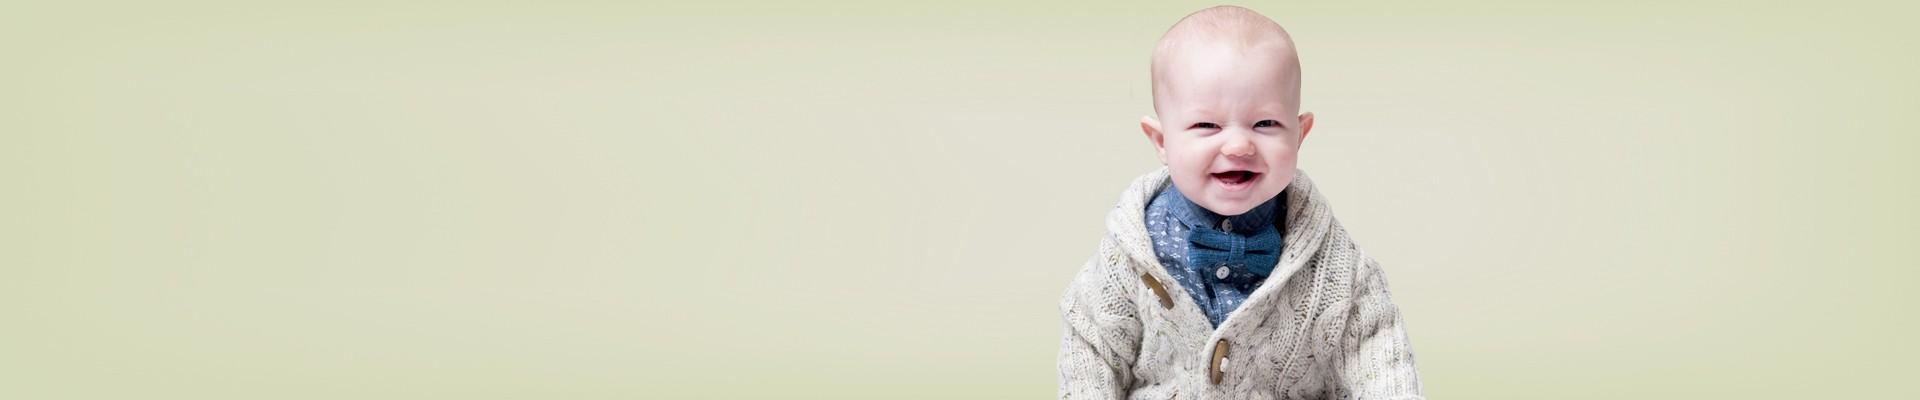 Jual Jaket Bayi & Sweater Bayi Unisex Baru Termurah